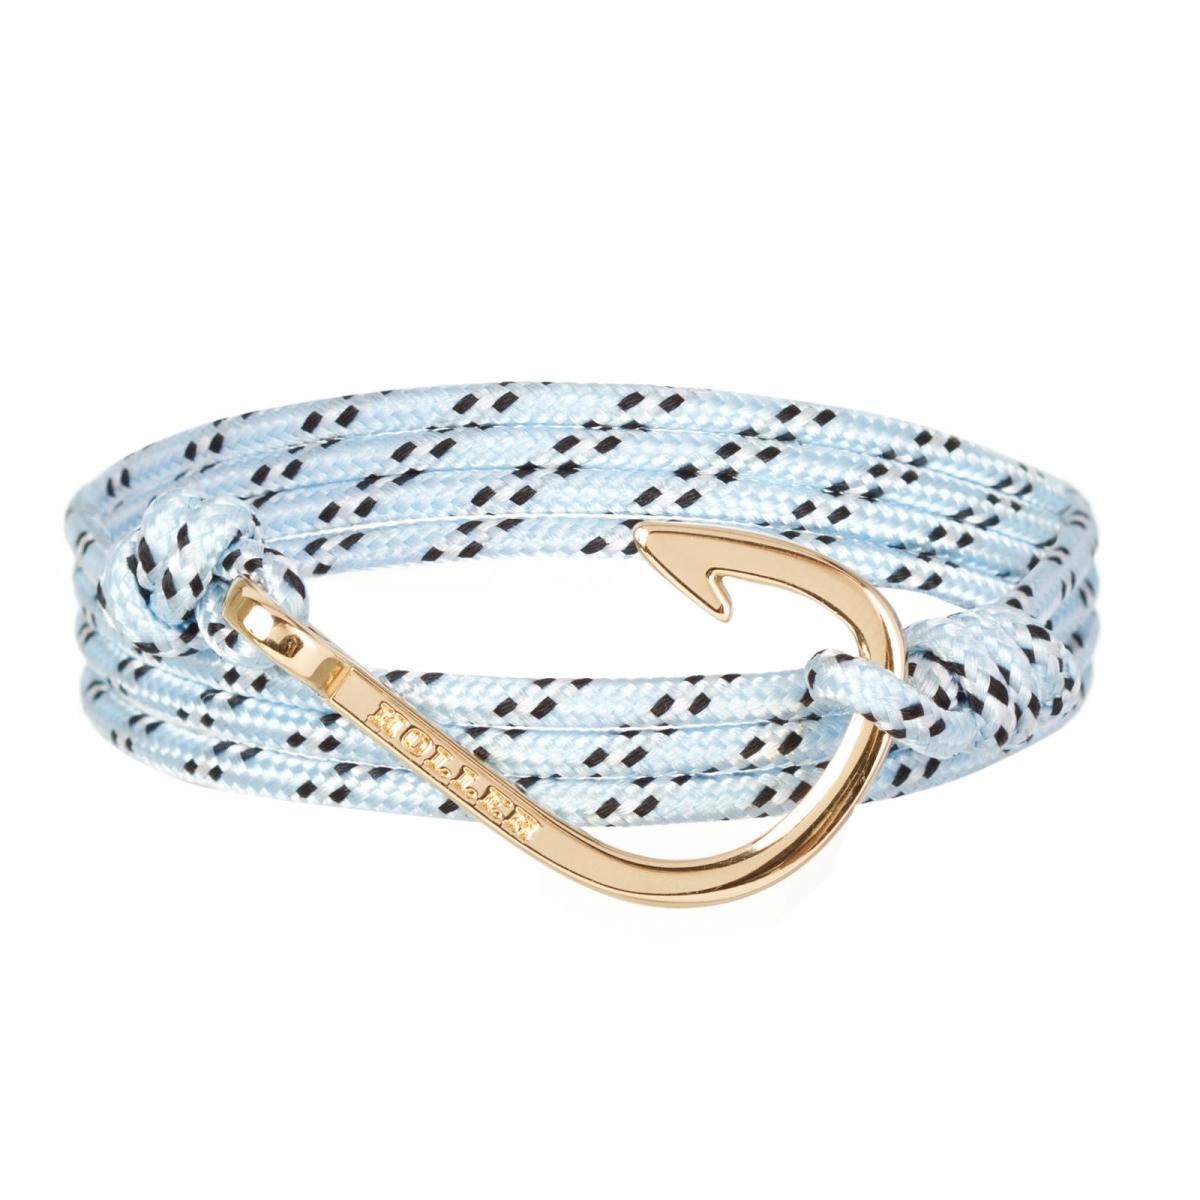 Kirby  Gold Polished Hook / Light Blue, Black and White Paracord Bracelet